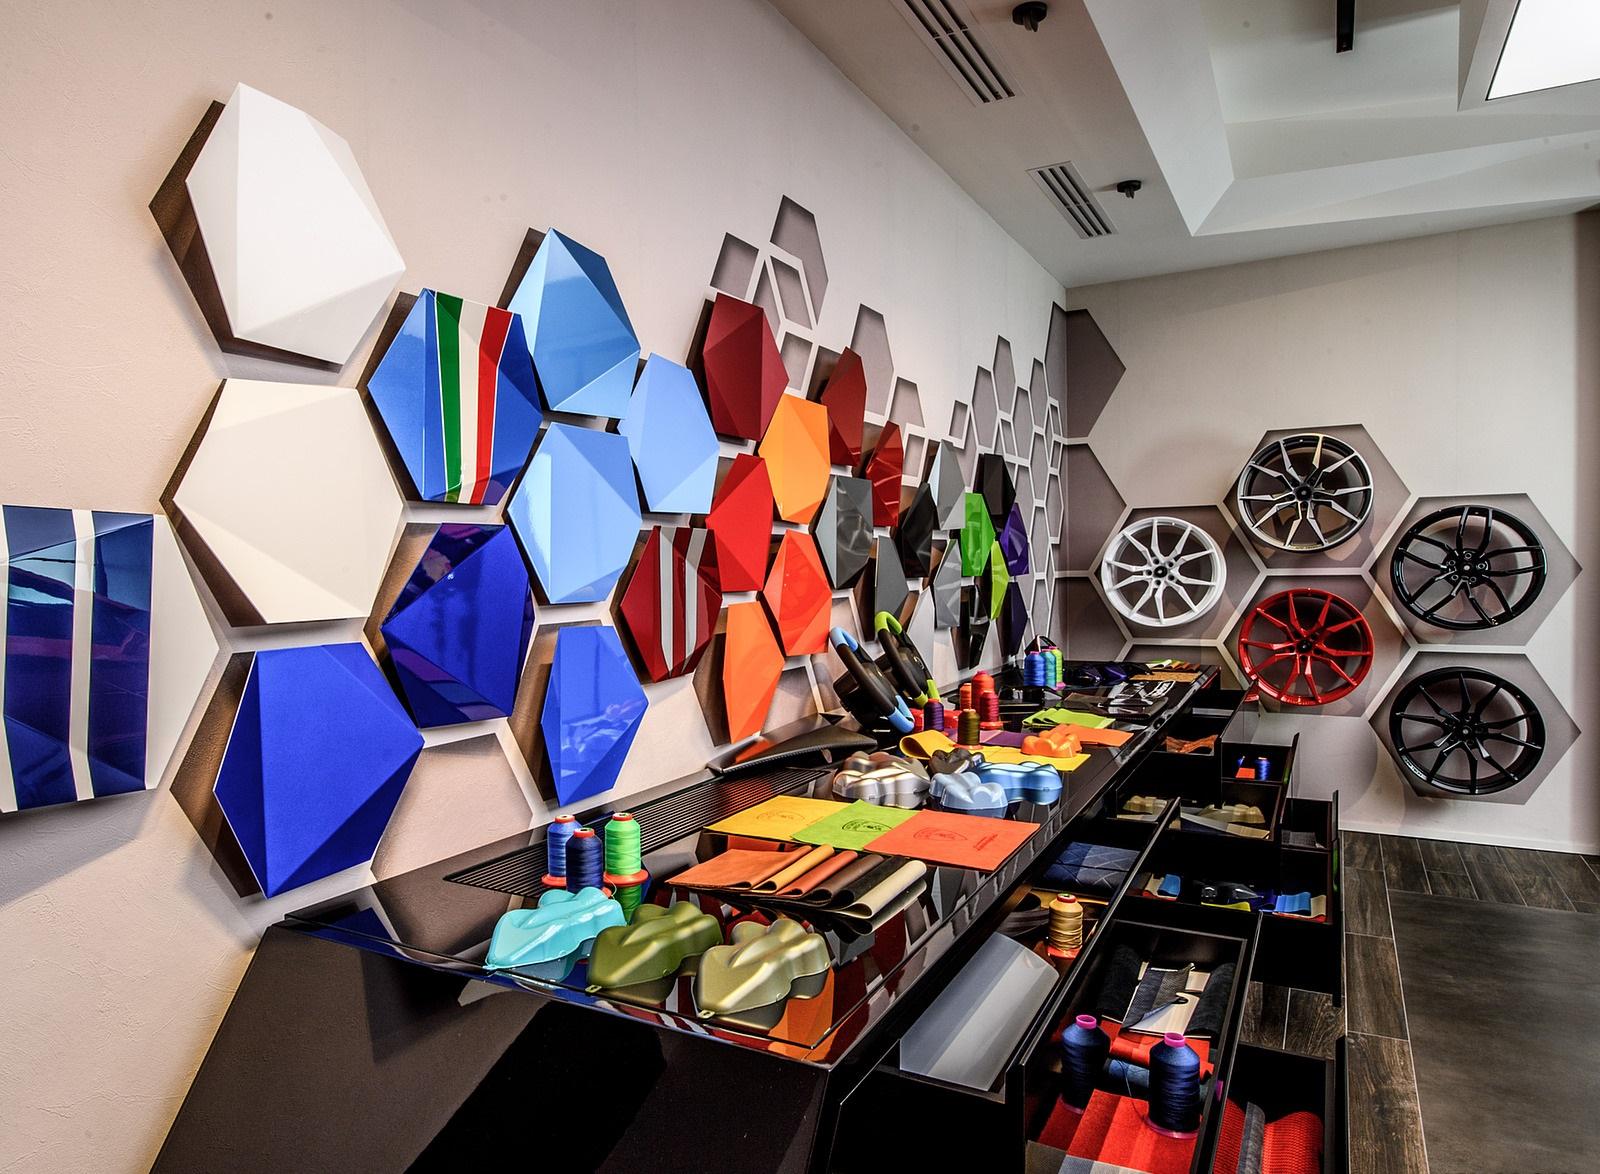 2020 Lamborghini Aventador SVJ Xago Edition Making Of Wallpapers (10)